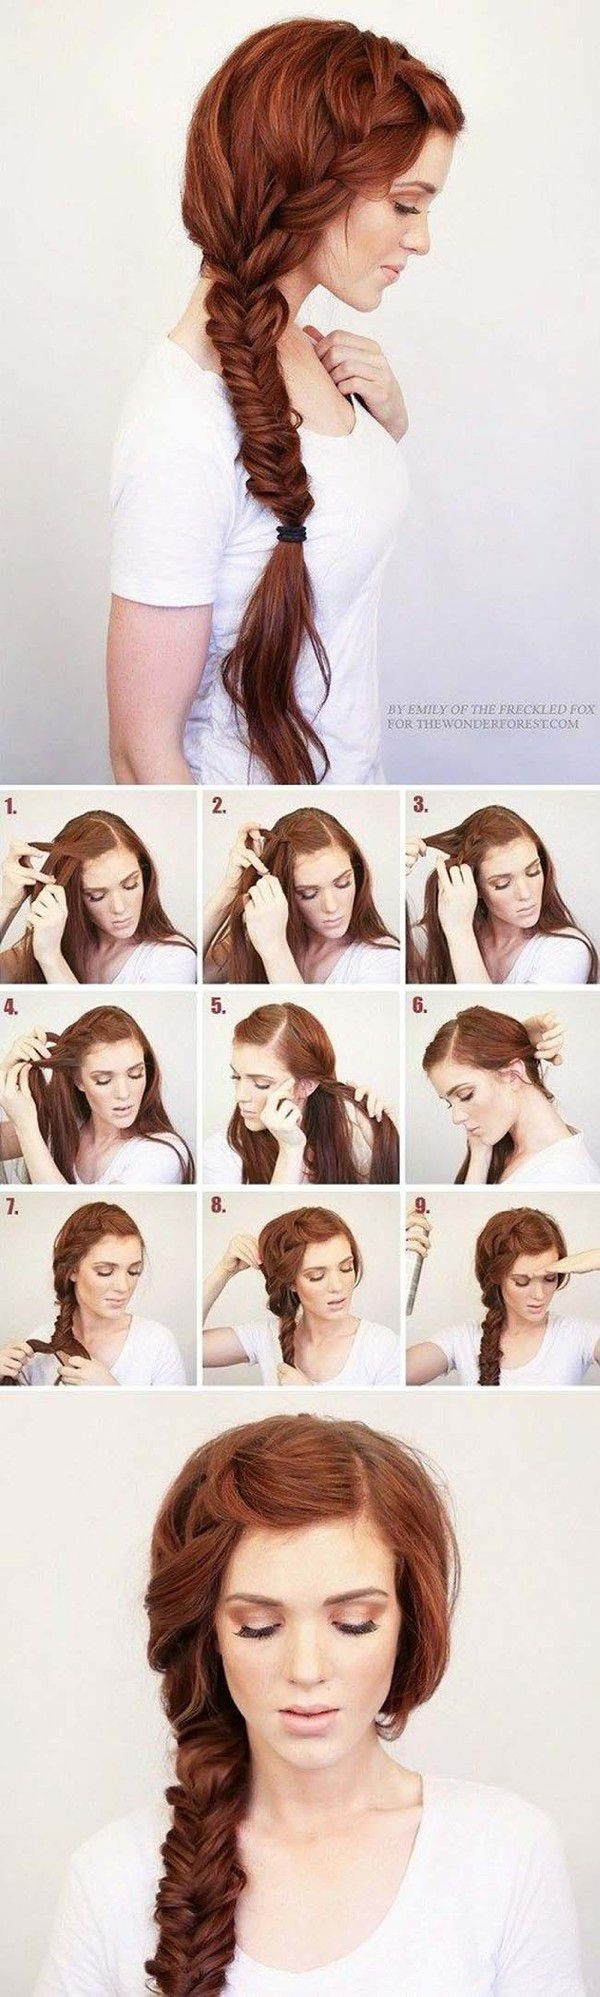 Причёски на бок своими руками в домашних условиях